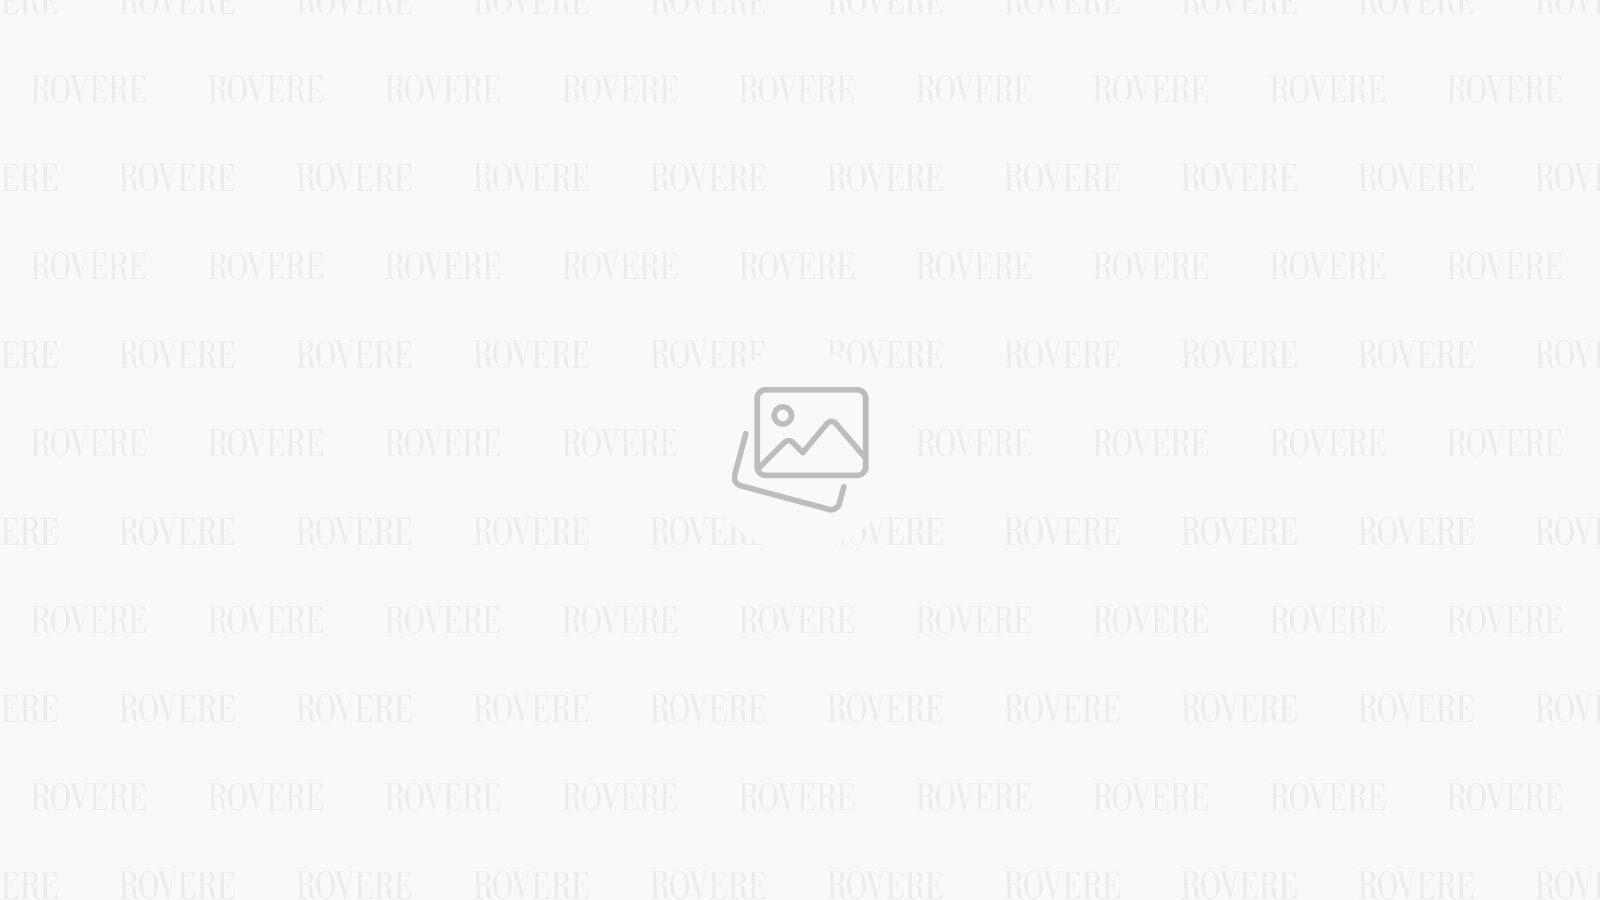 Canapea cu sezlong dreapta Stupore textil culoarea Dark Grey